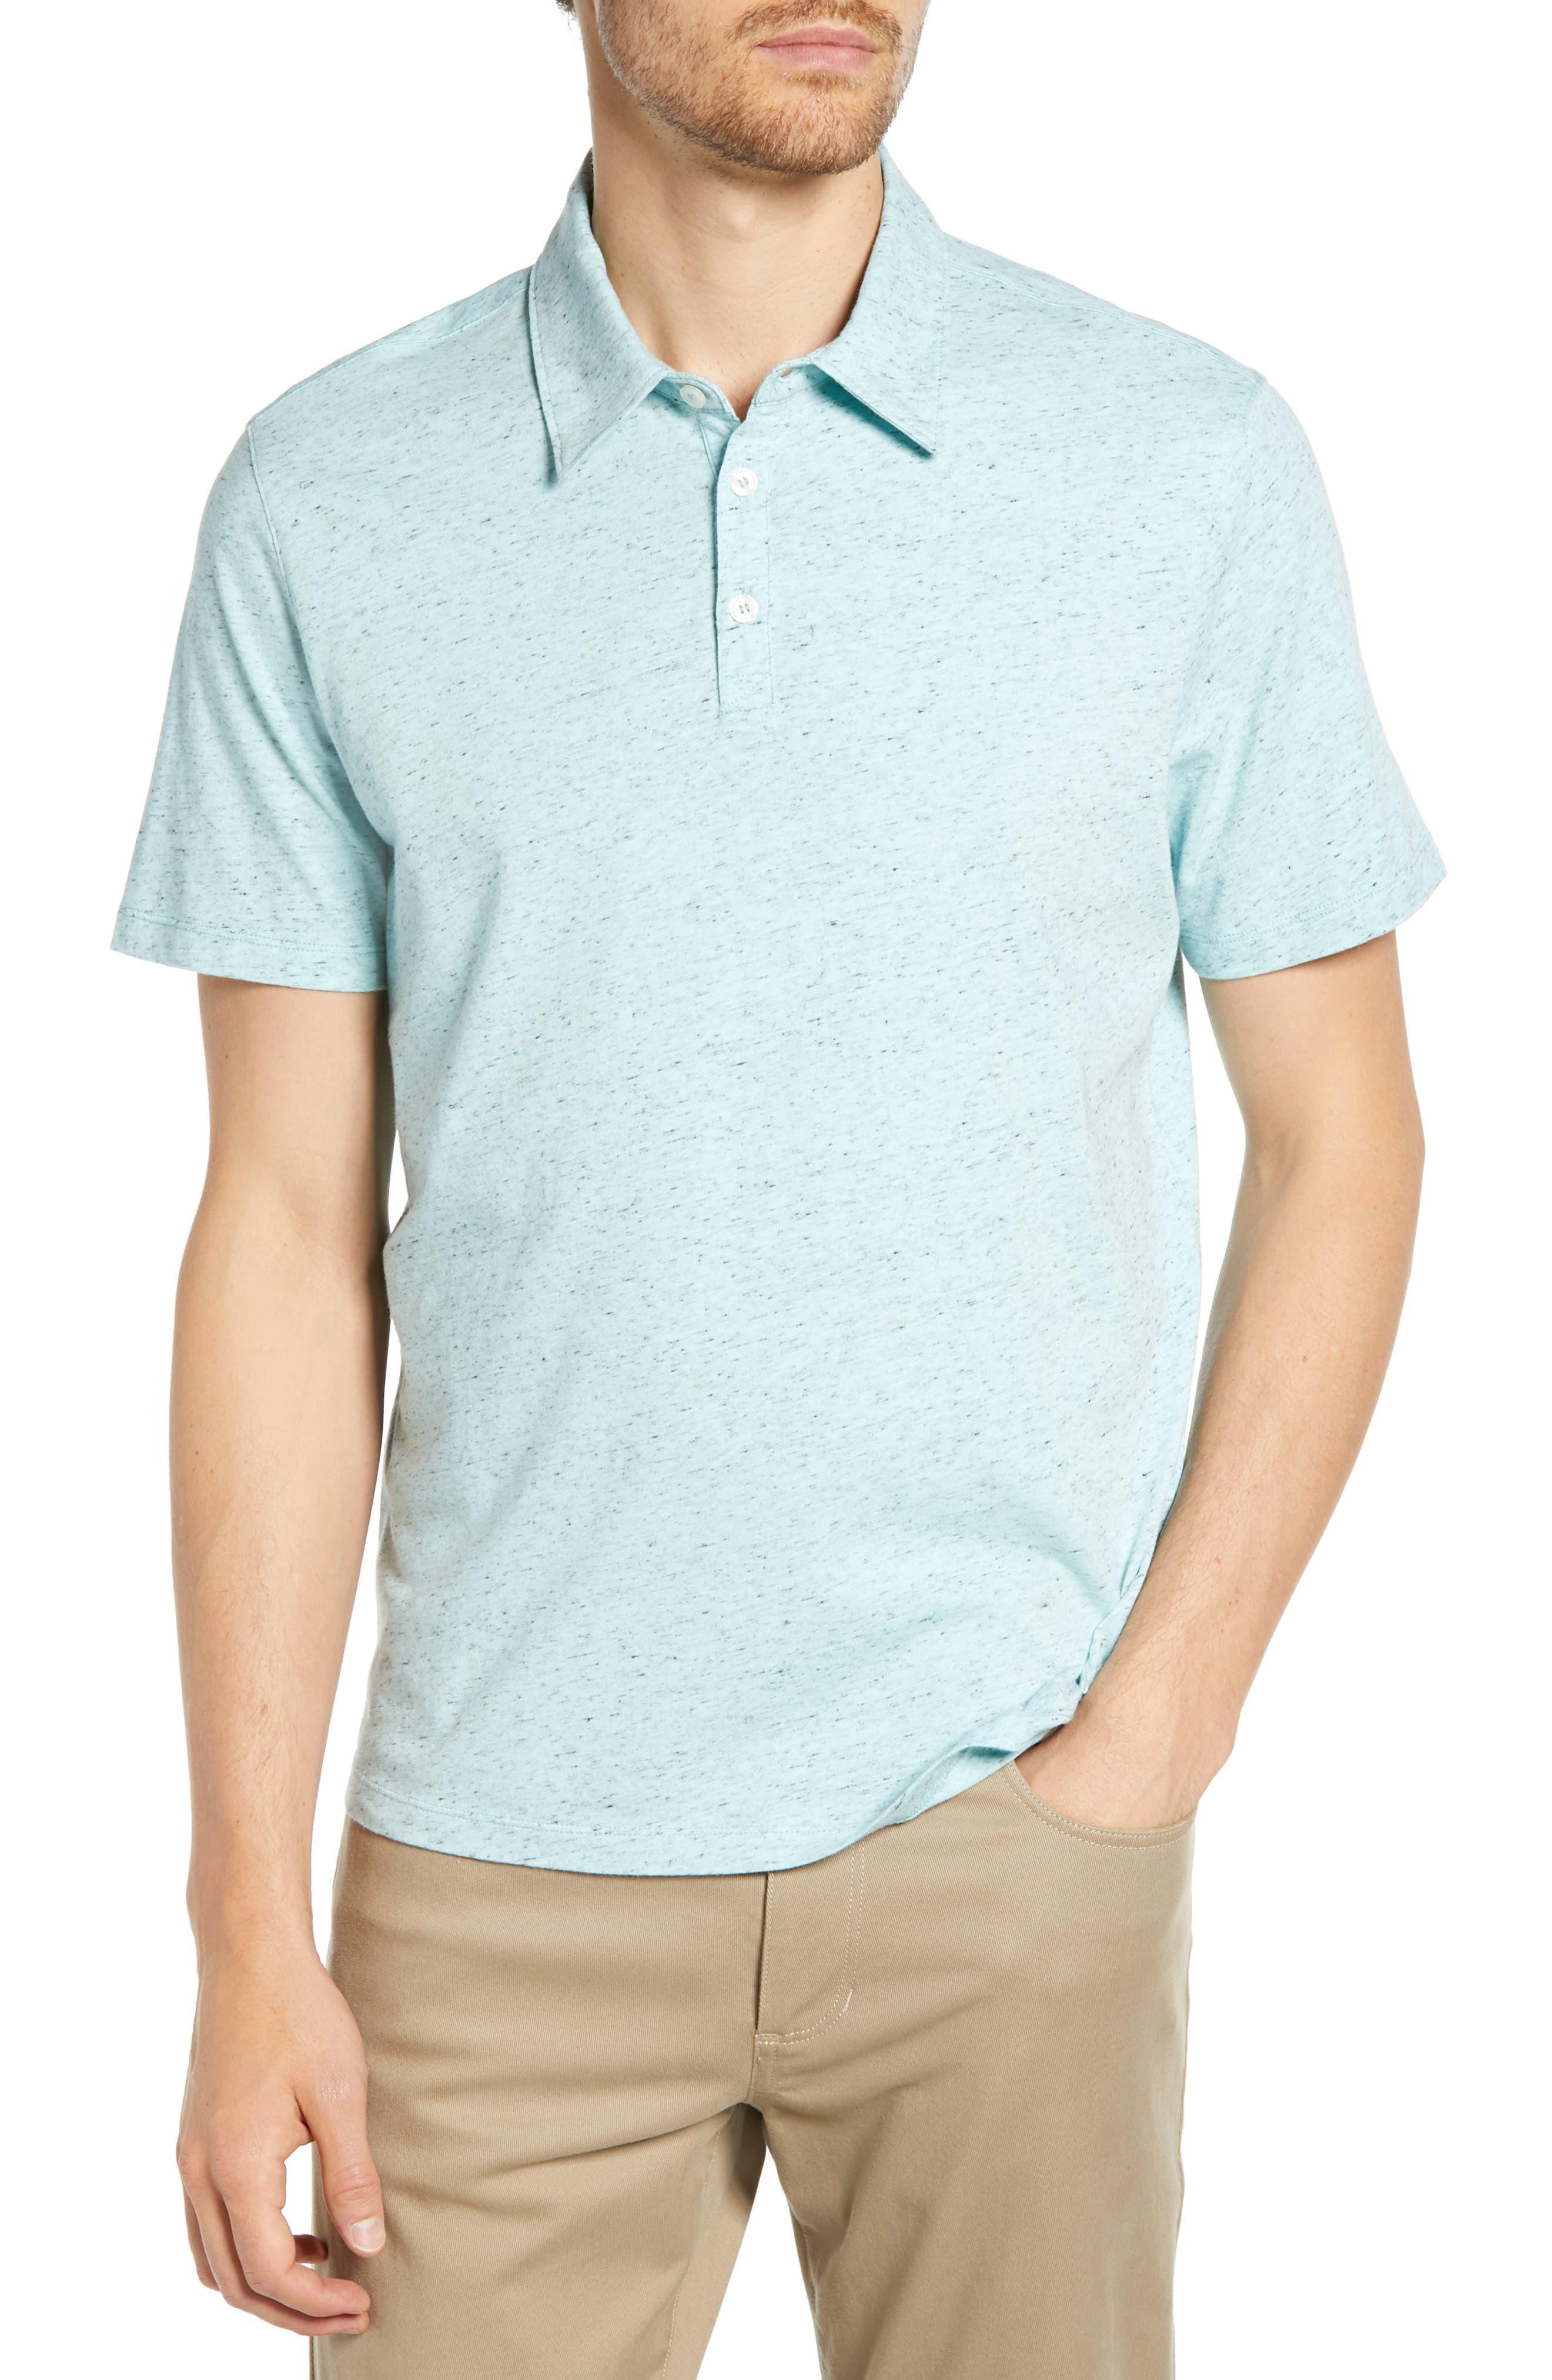 Cadler Regular Fit Polo Shirt, Main, color, 435